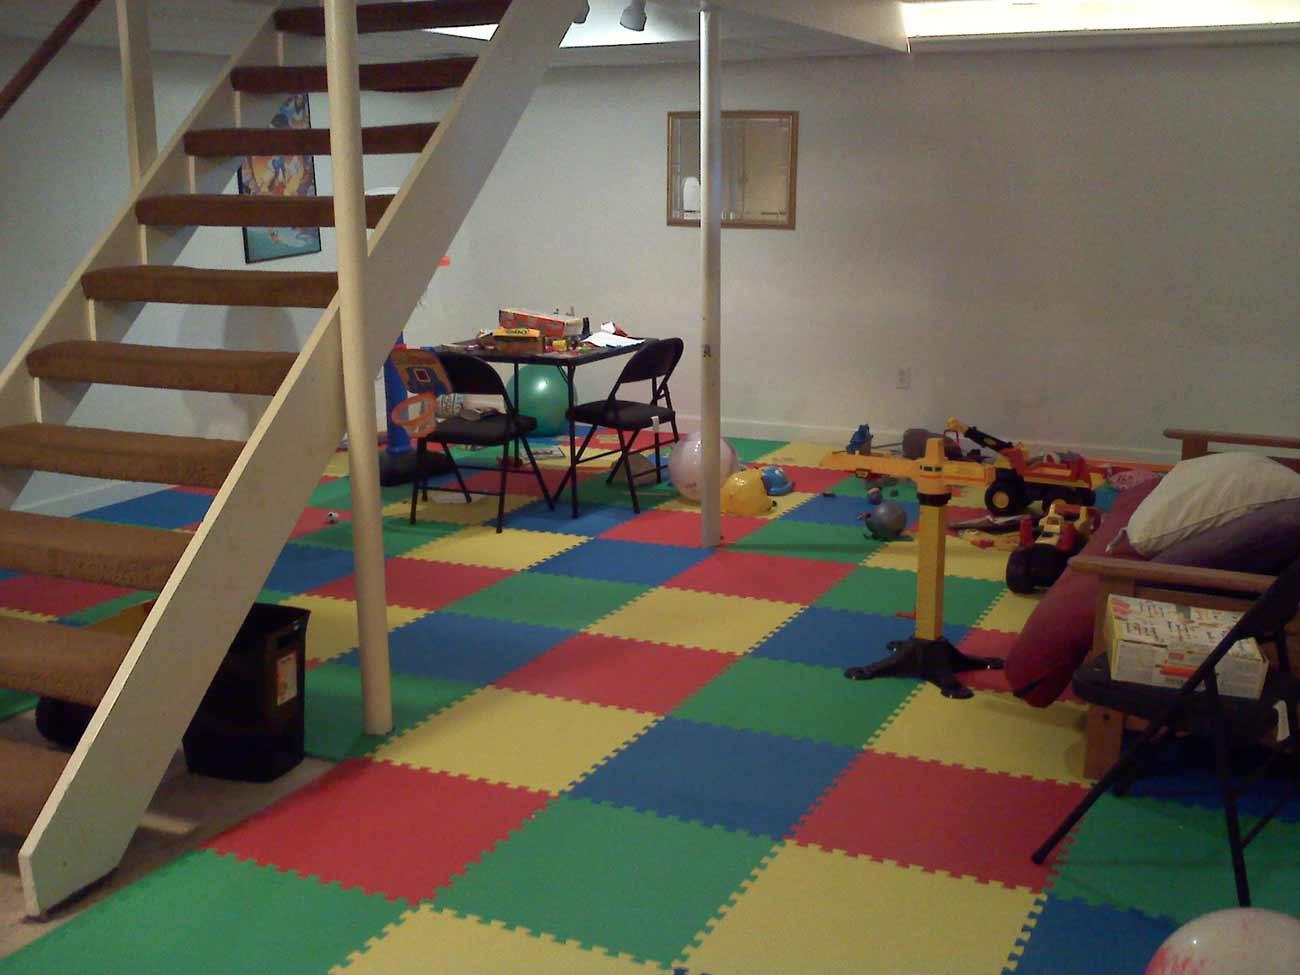 Best Carpet For Kids Room  Best Carpet for Basement Remodeling Ideas